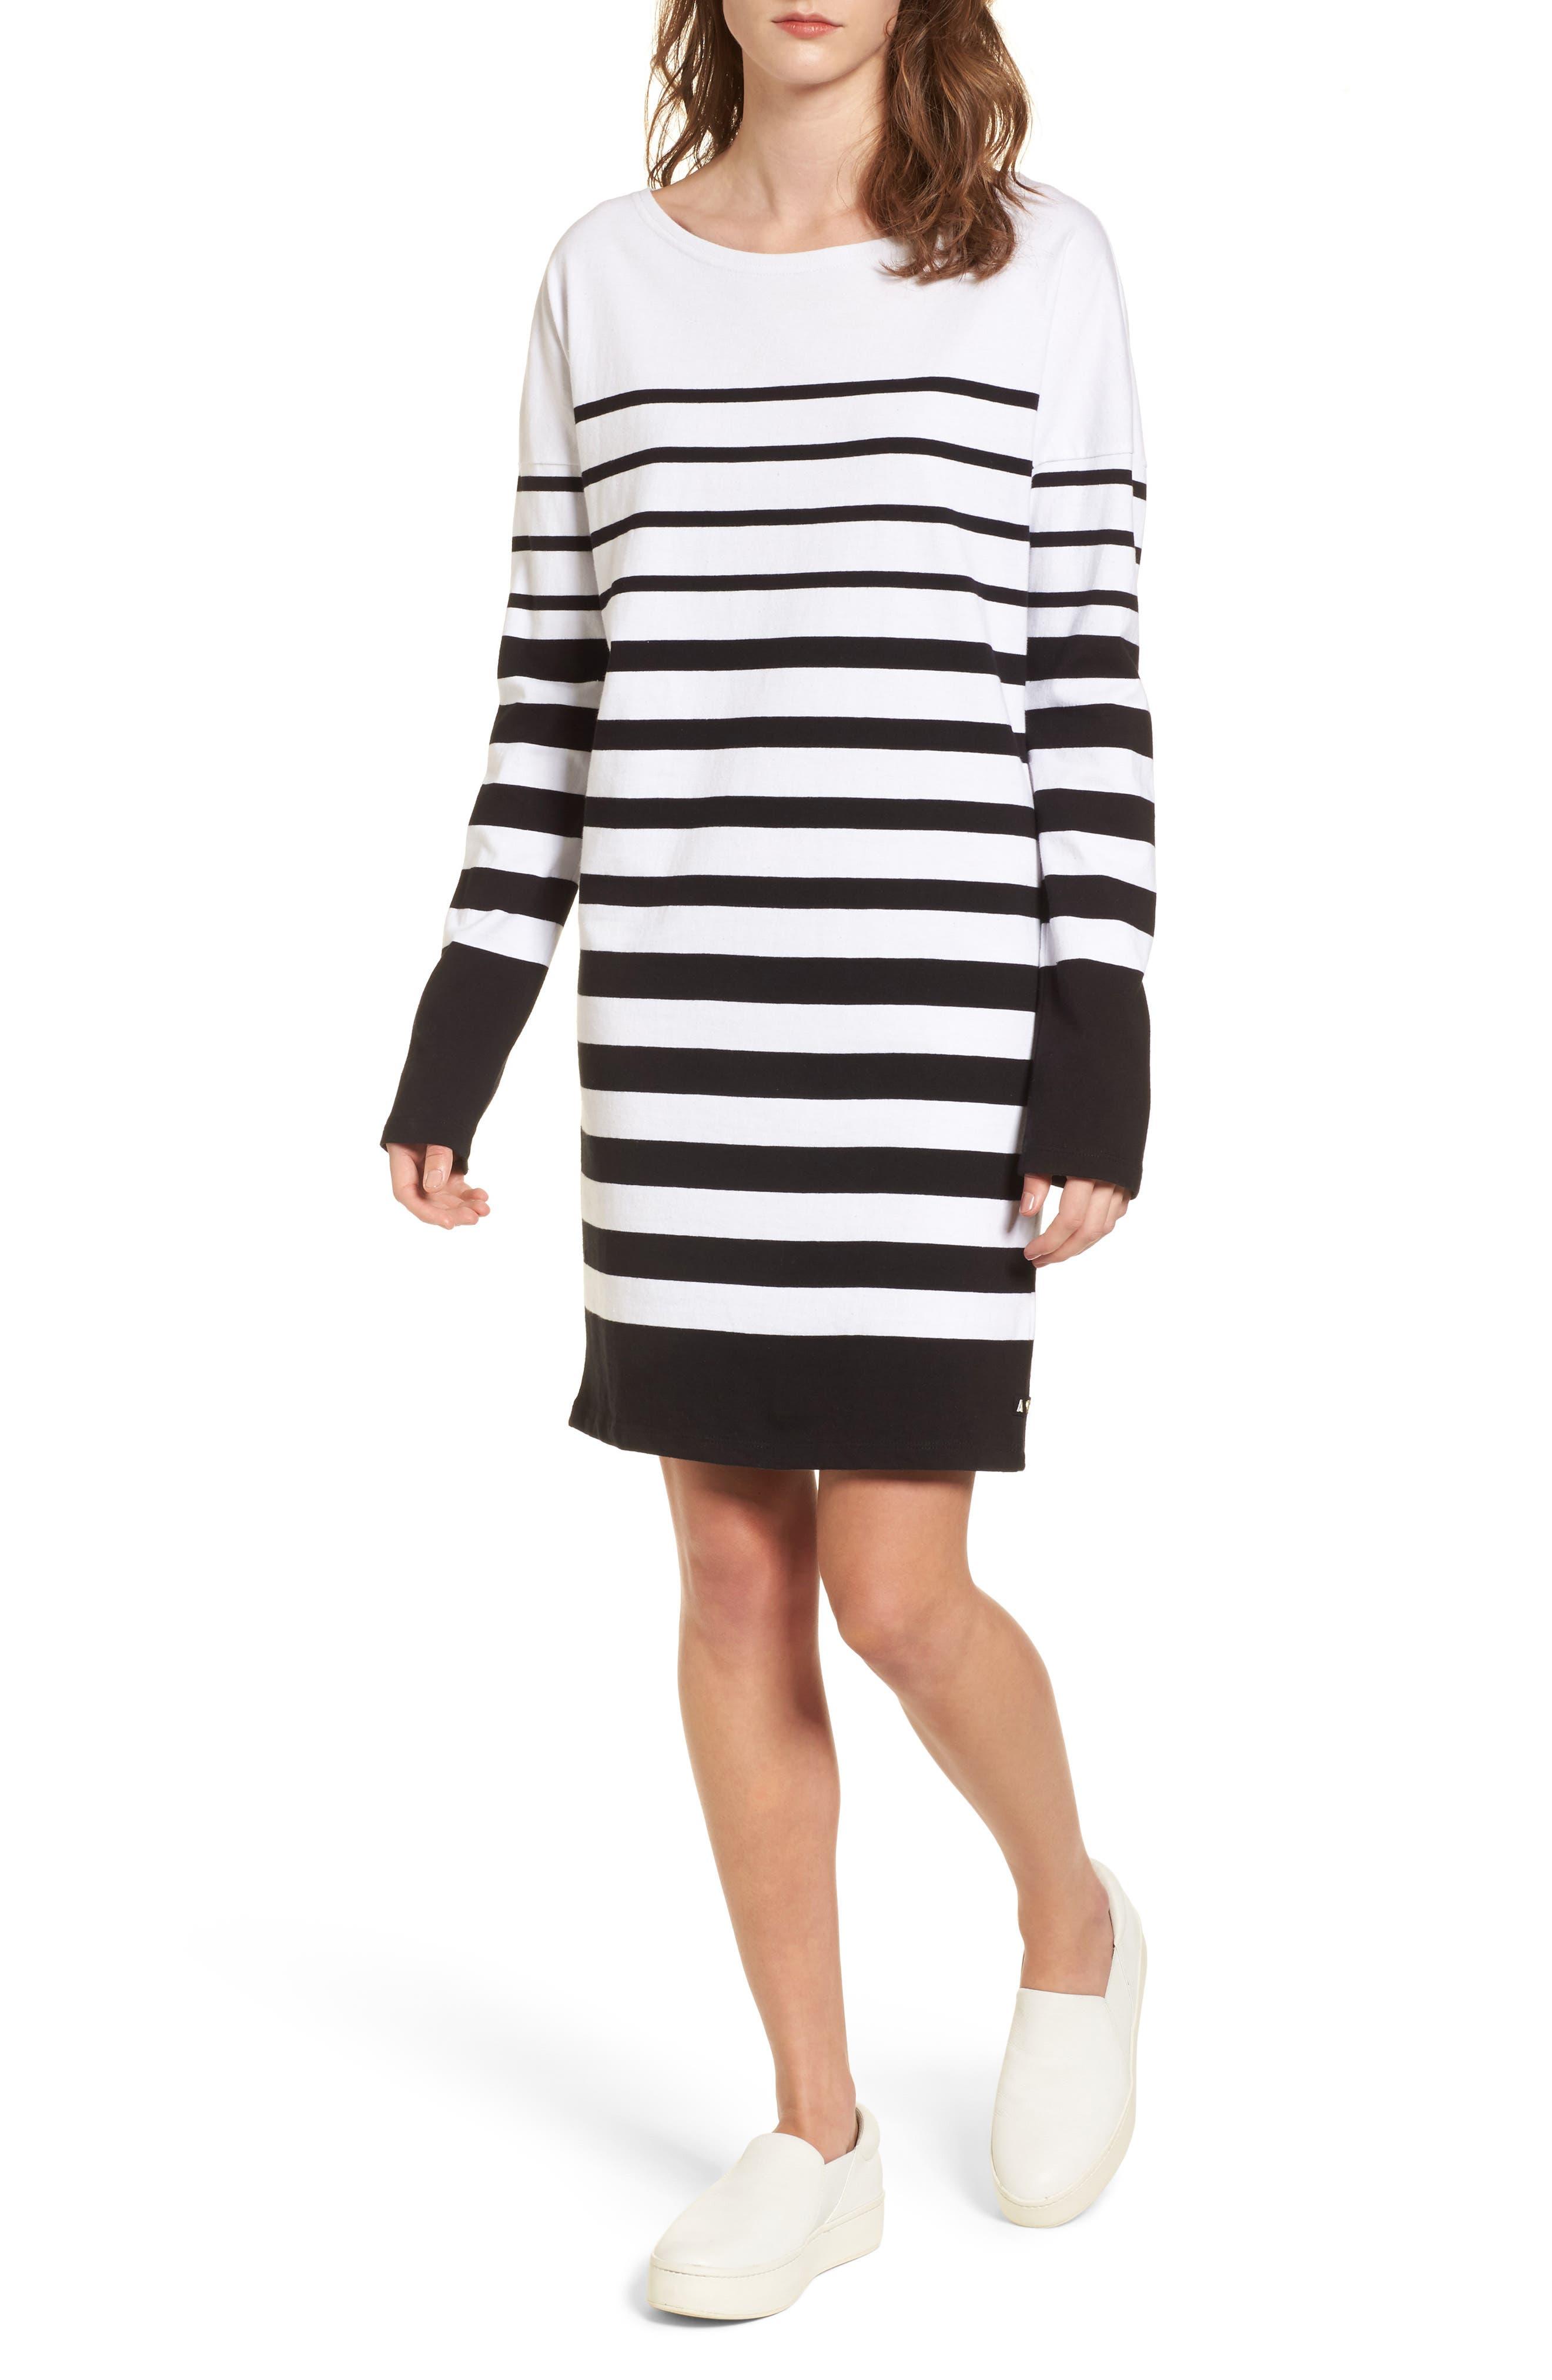 Breton Stripe Cotton Shift Dress,                         Main,                         color, Black/ White